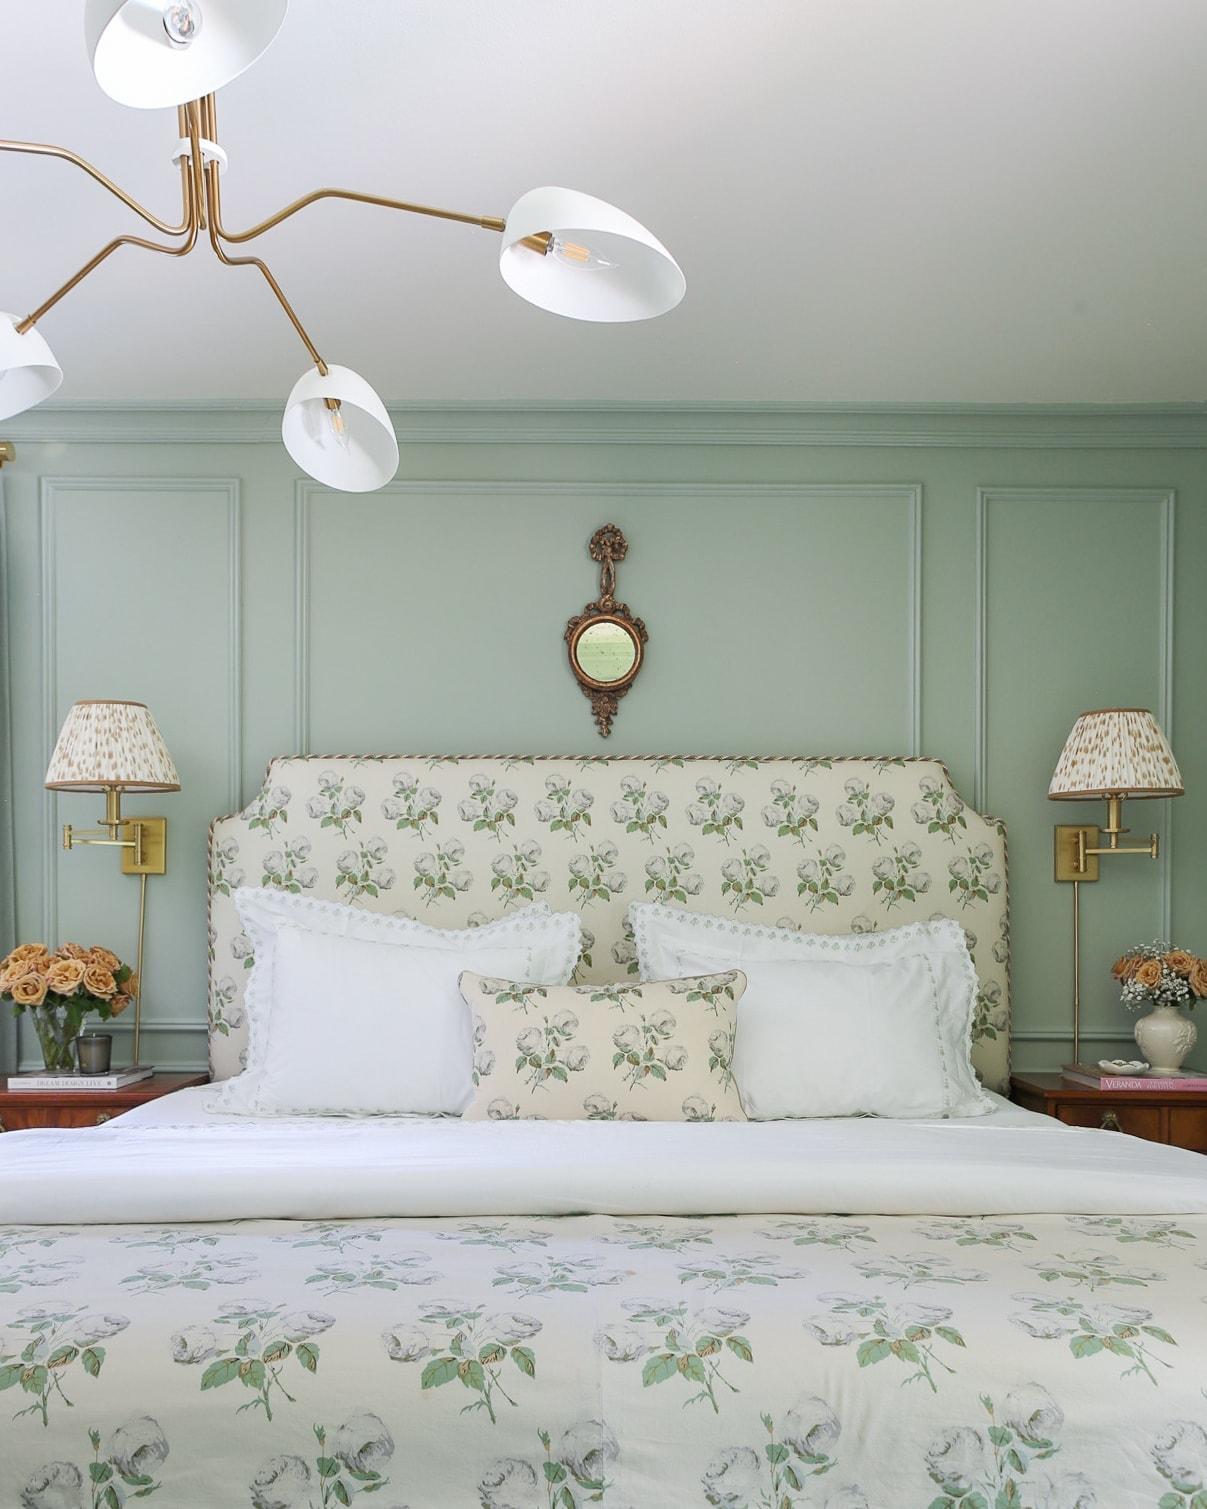 colefax-fowler-bowood-bedroom-design-inspiration-ideas-grandmillennial